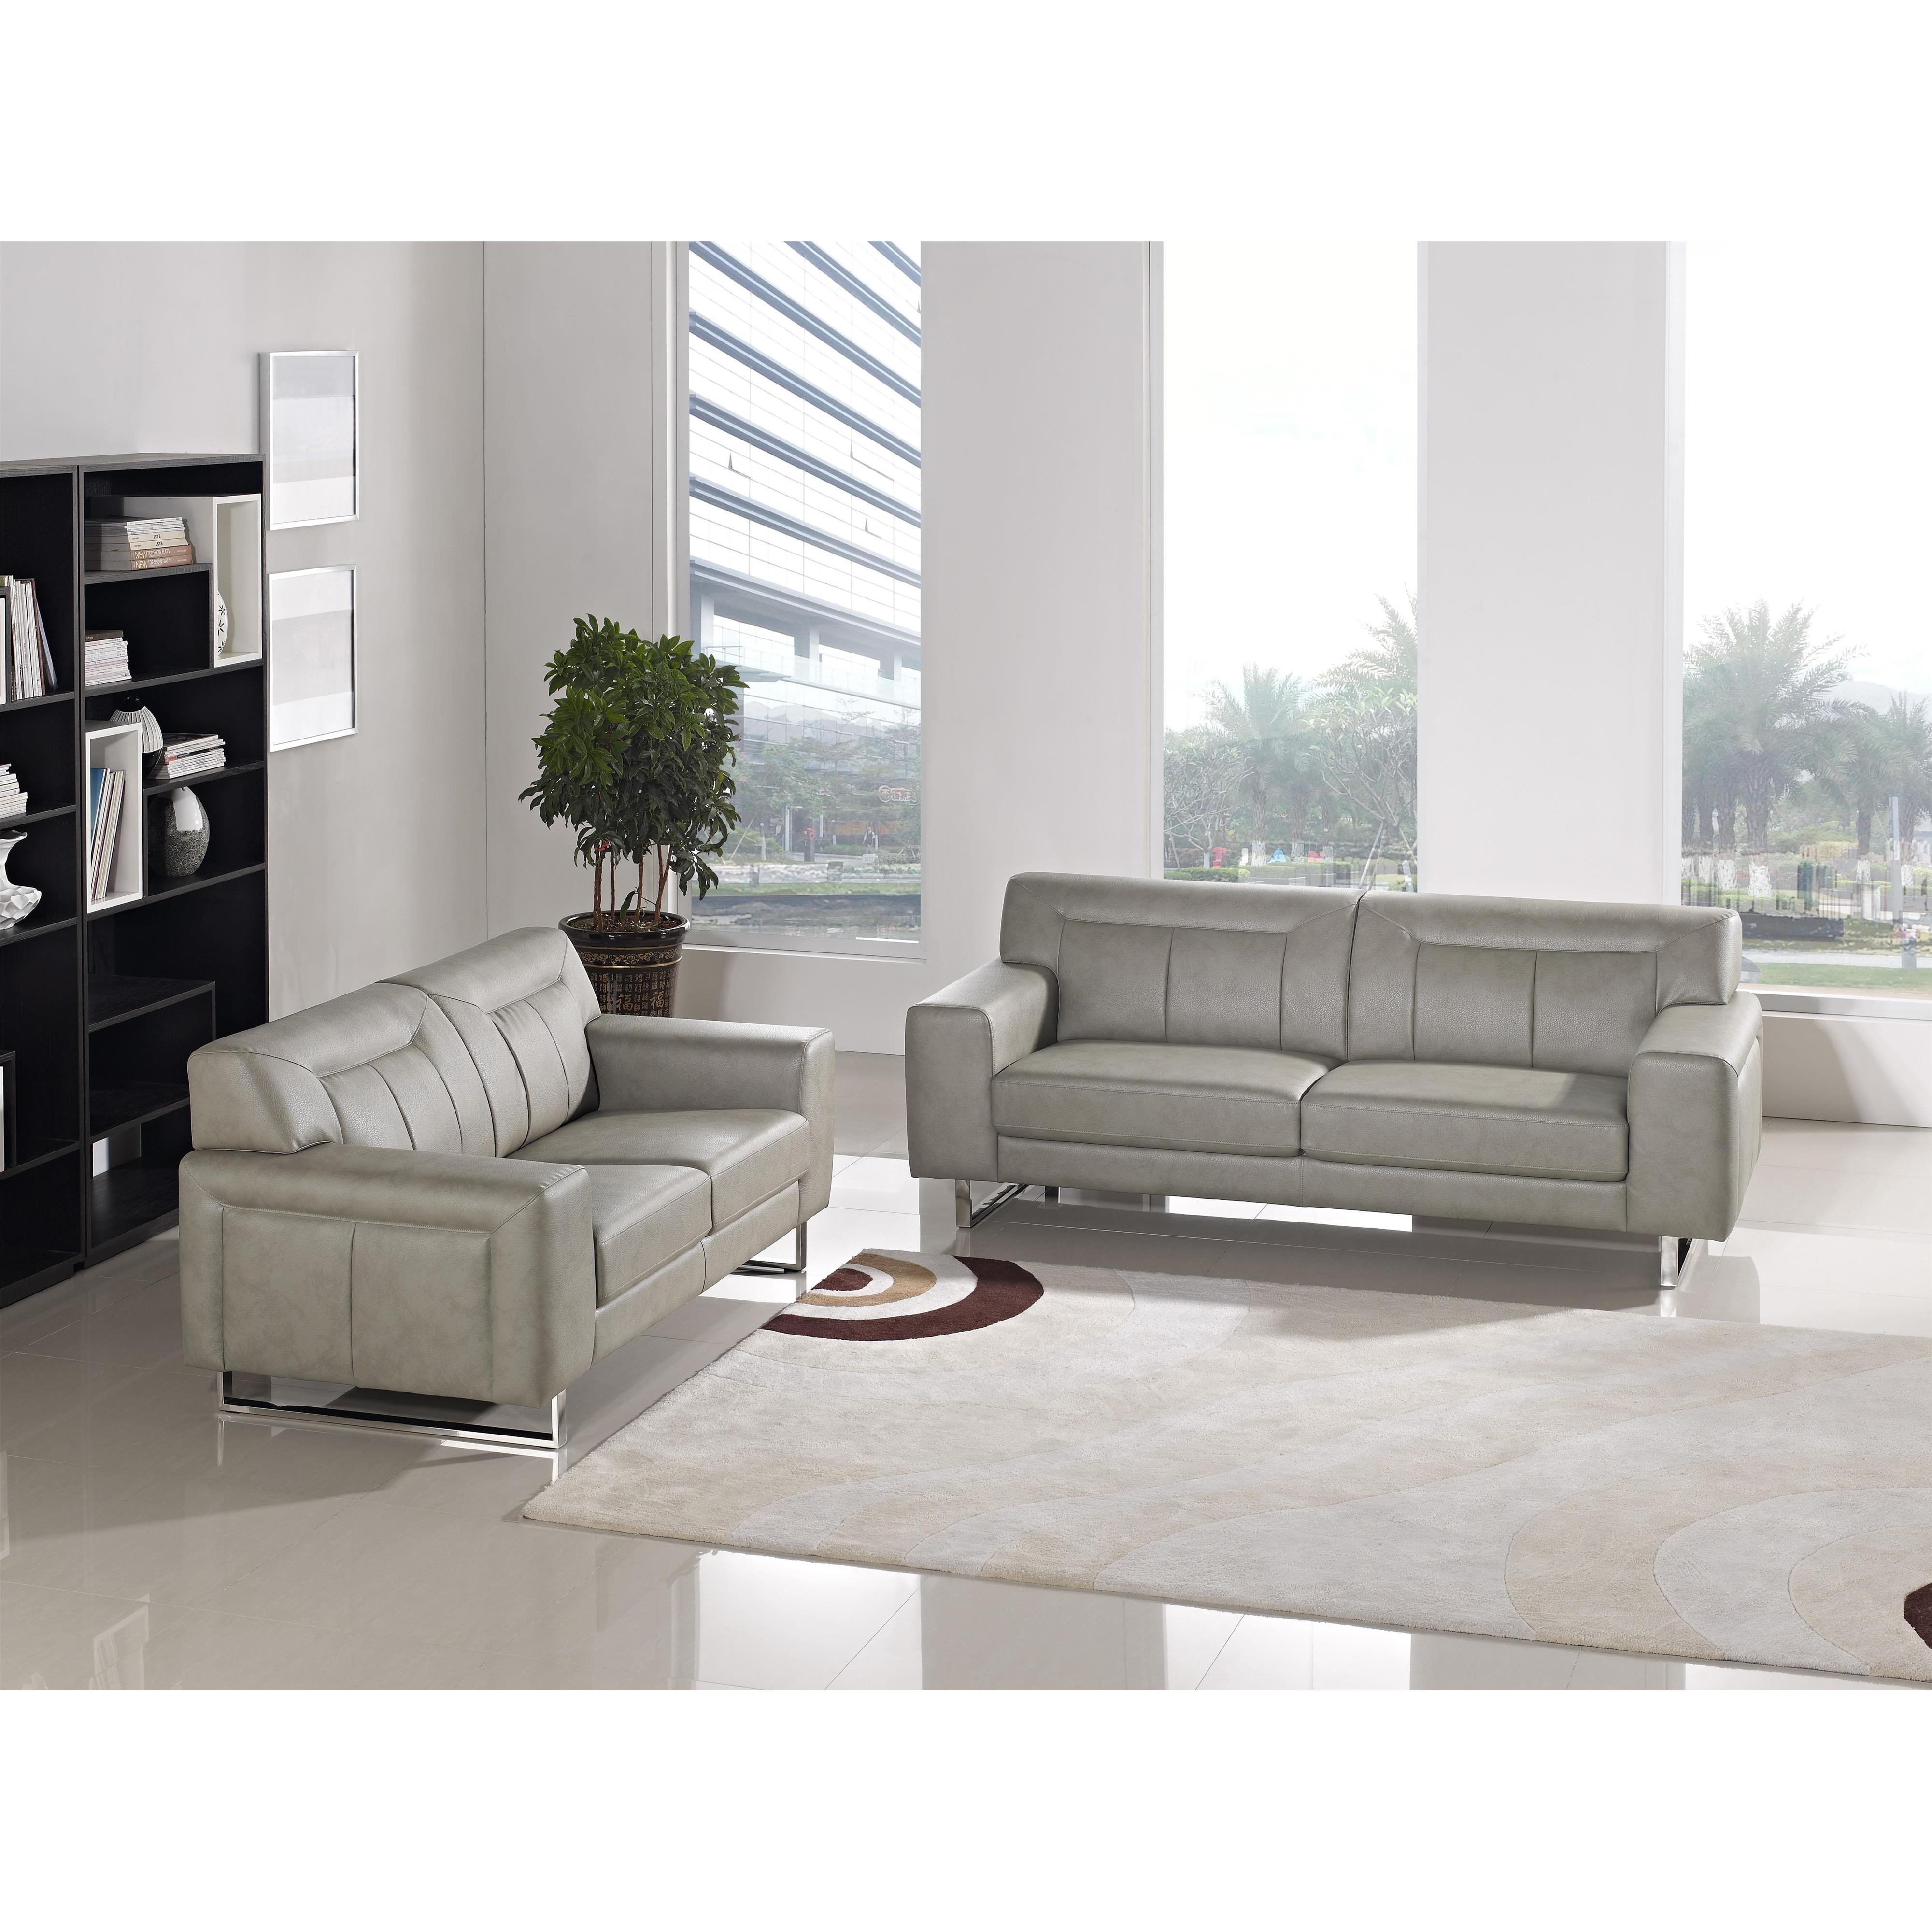 Diamond Sofa Vera VERASLSS Leatherette Sofa/Loveseat 2PC Set with ...